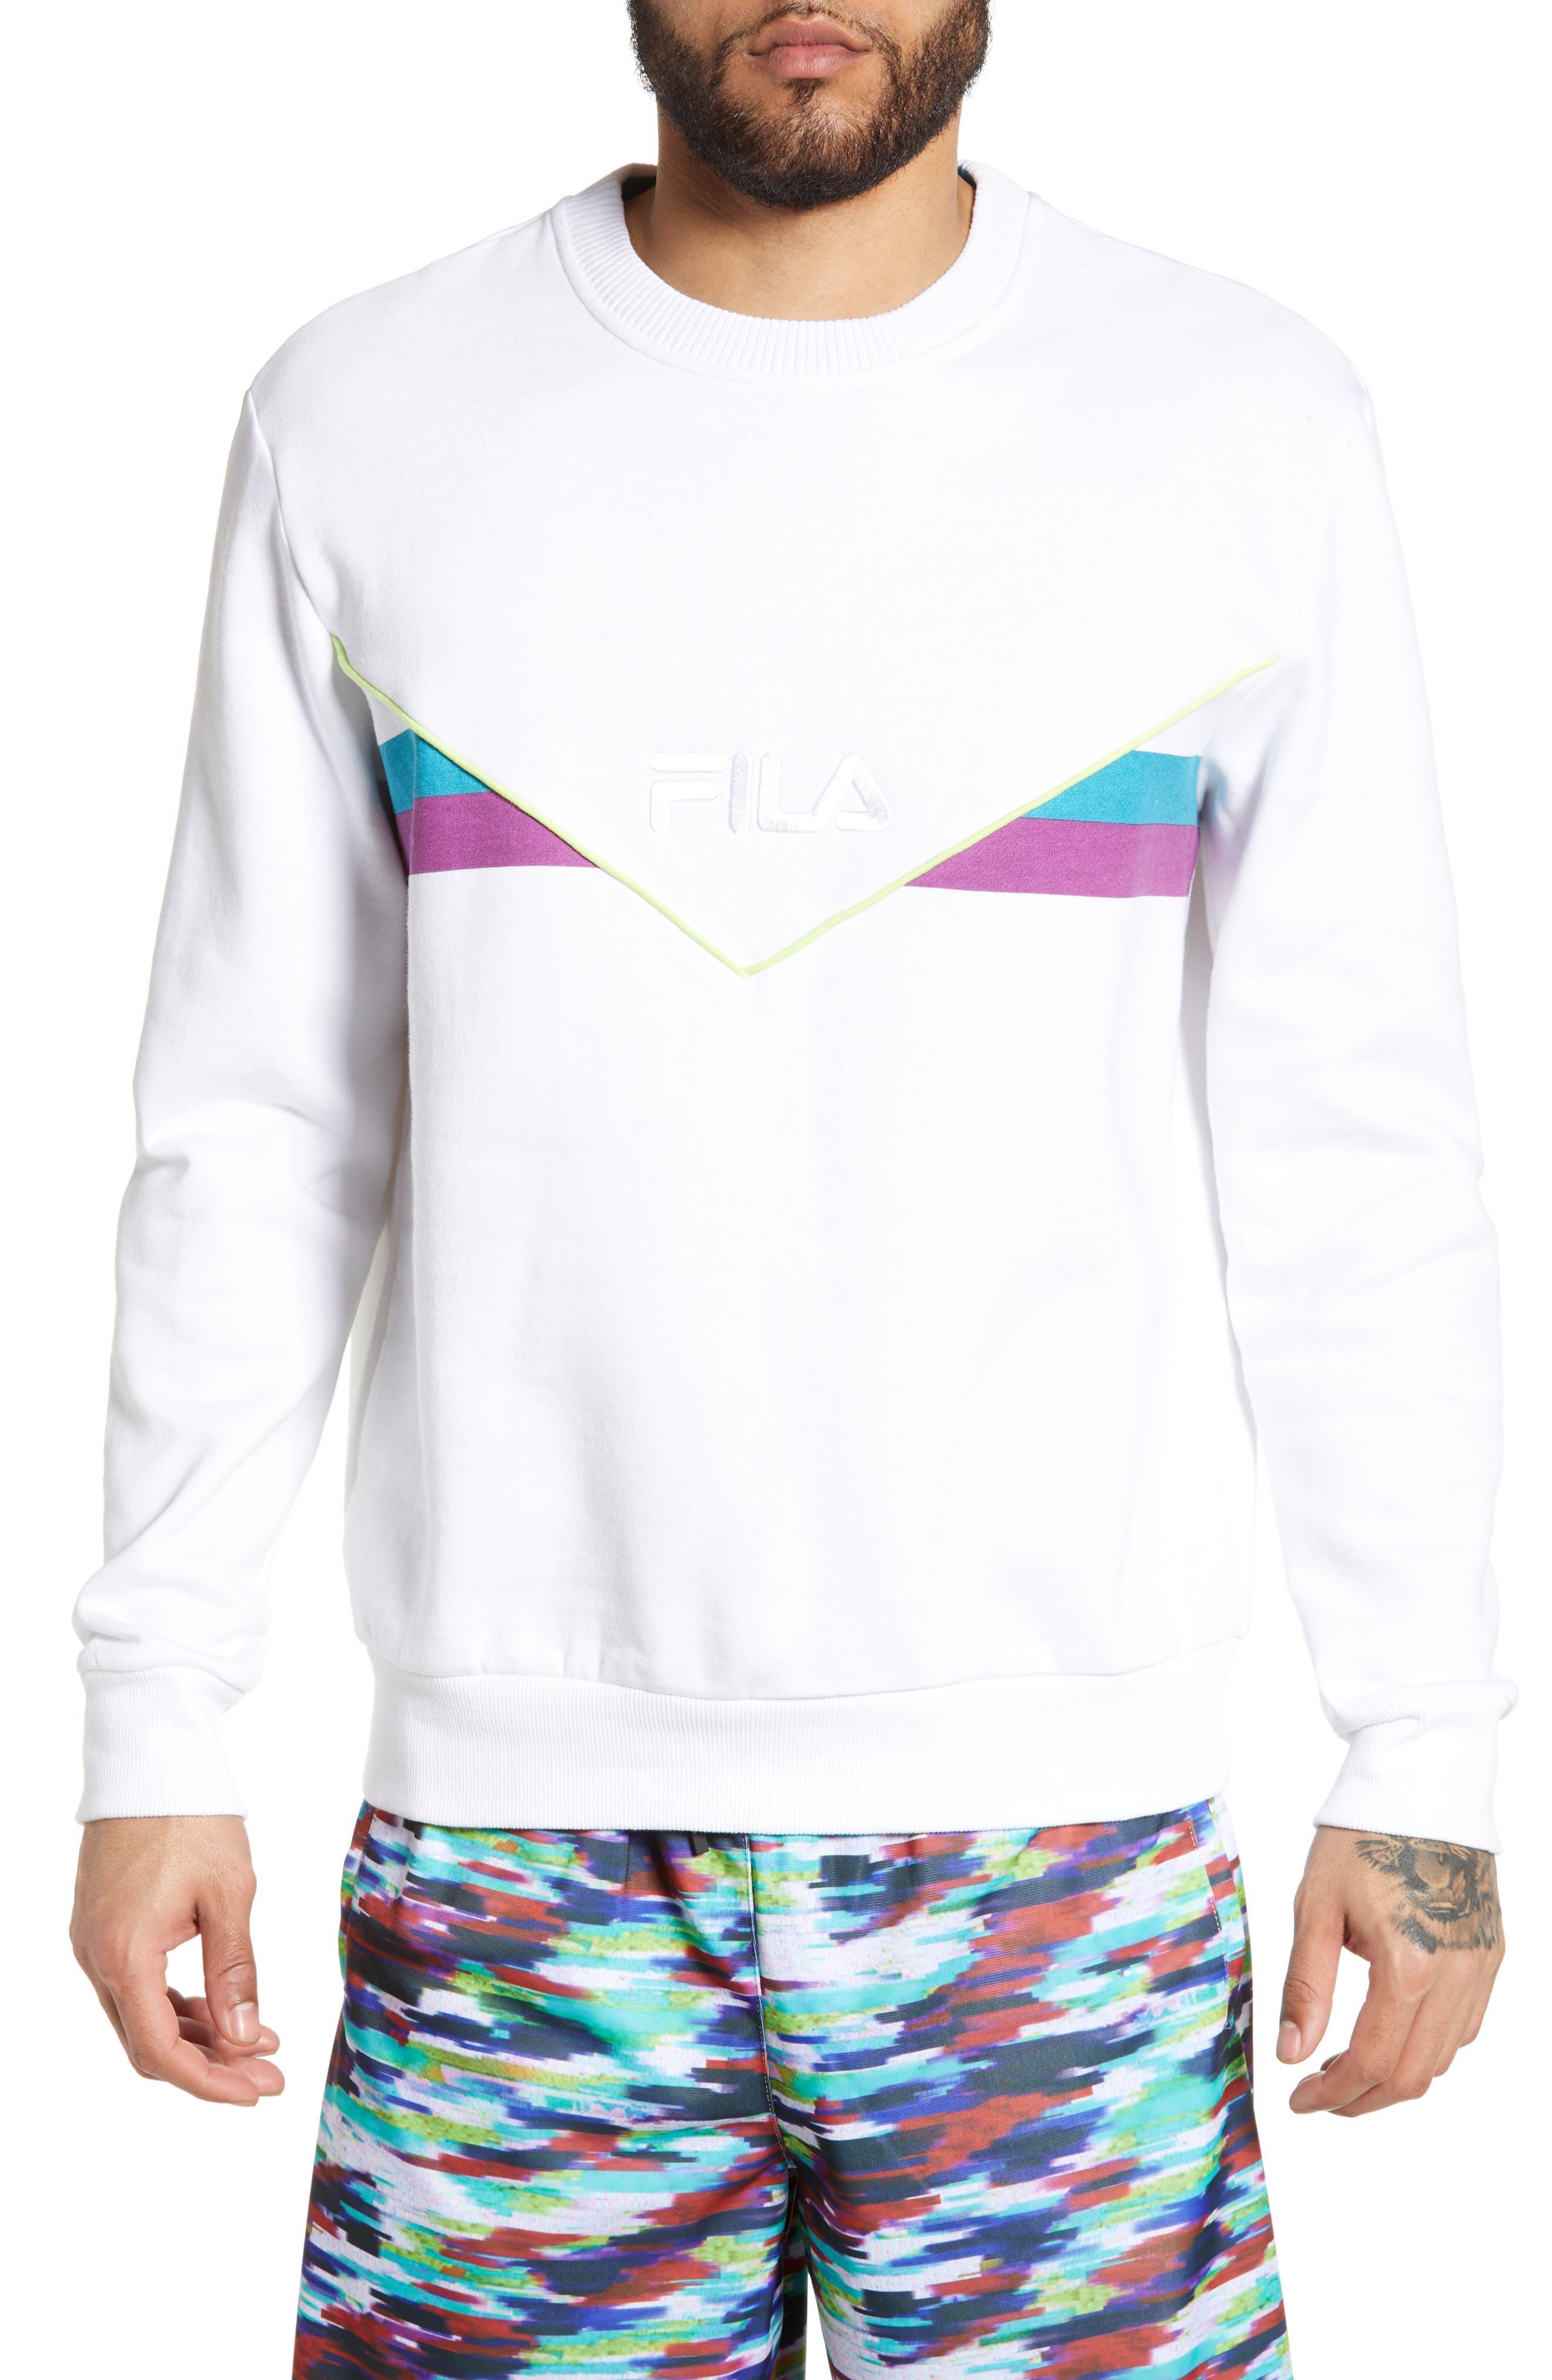 FILA Leroy Chevron Sweatshirt, Main, color, WHITE